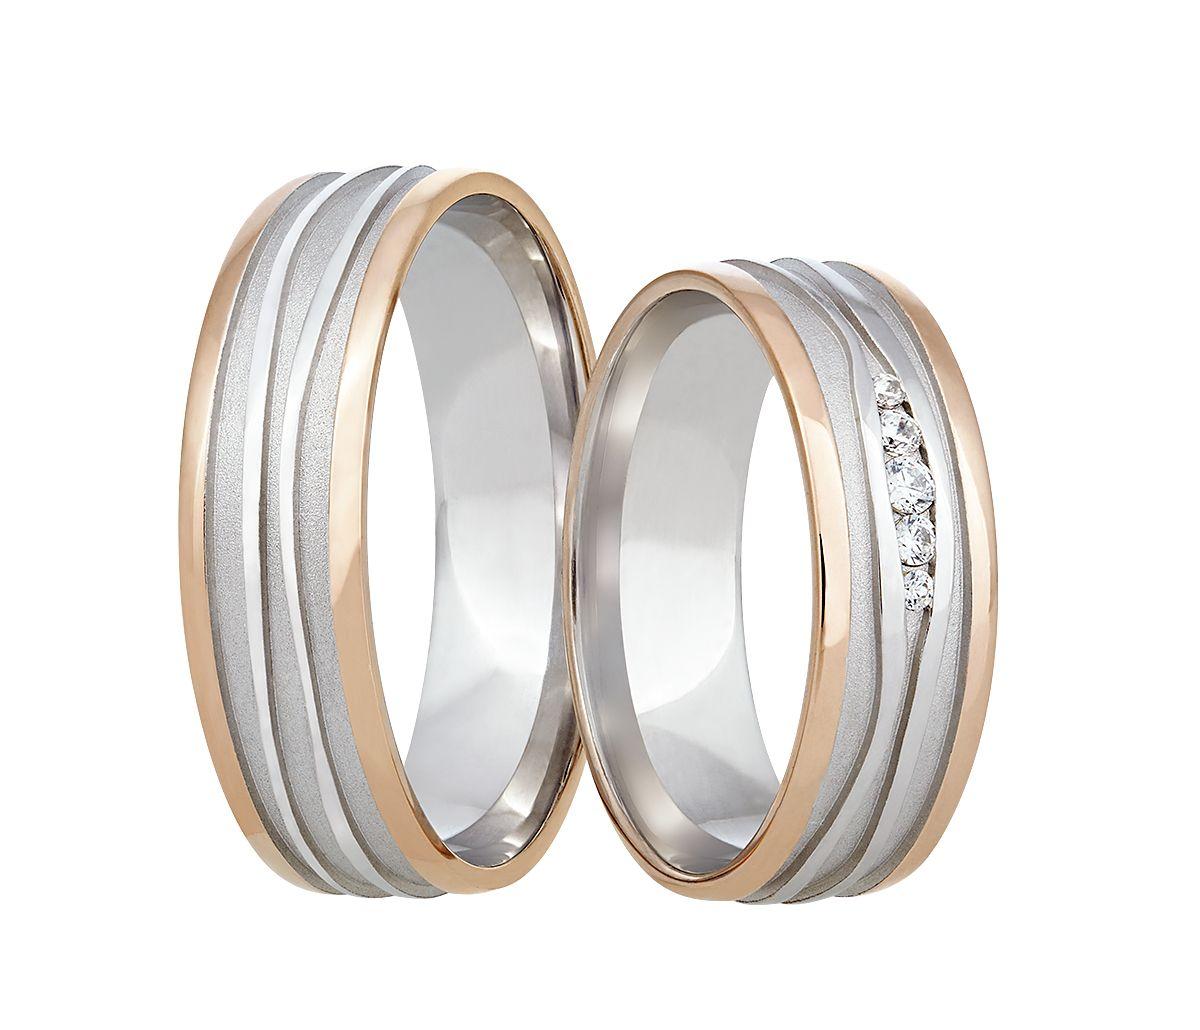 Masivni Snubni Prsteny V Kombinaci Bileho A Cerveneho Zlata Zdobi